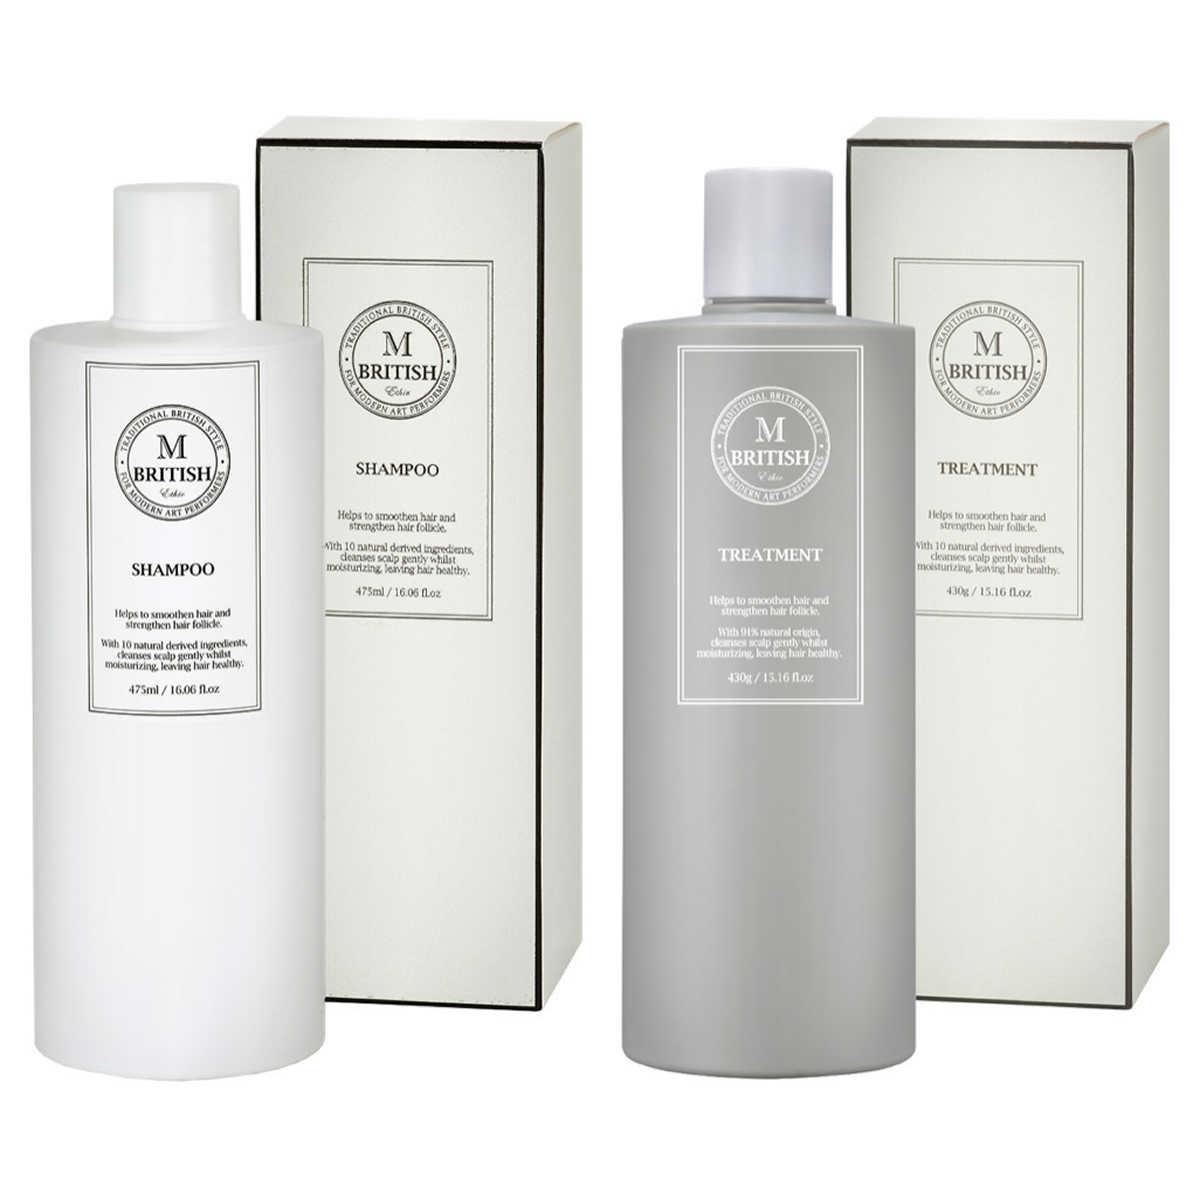 BRITISH M Ethic Expect More Shampoo & Treatment Set